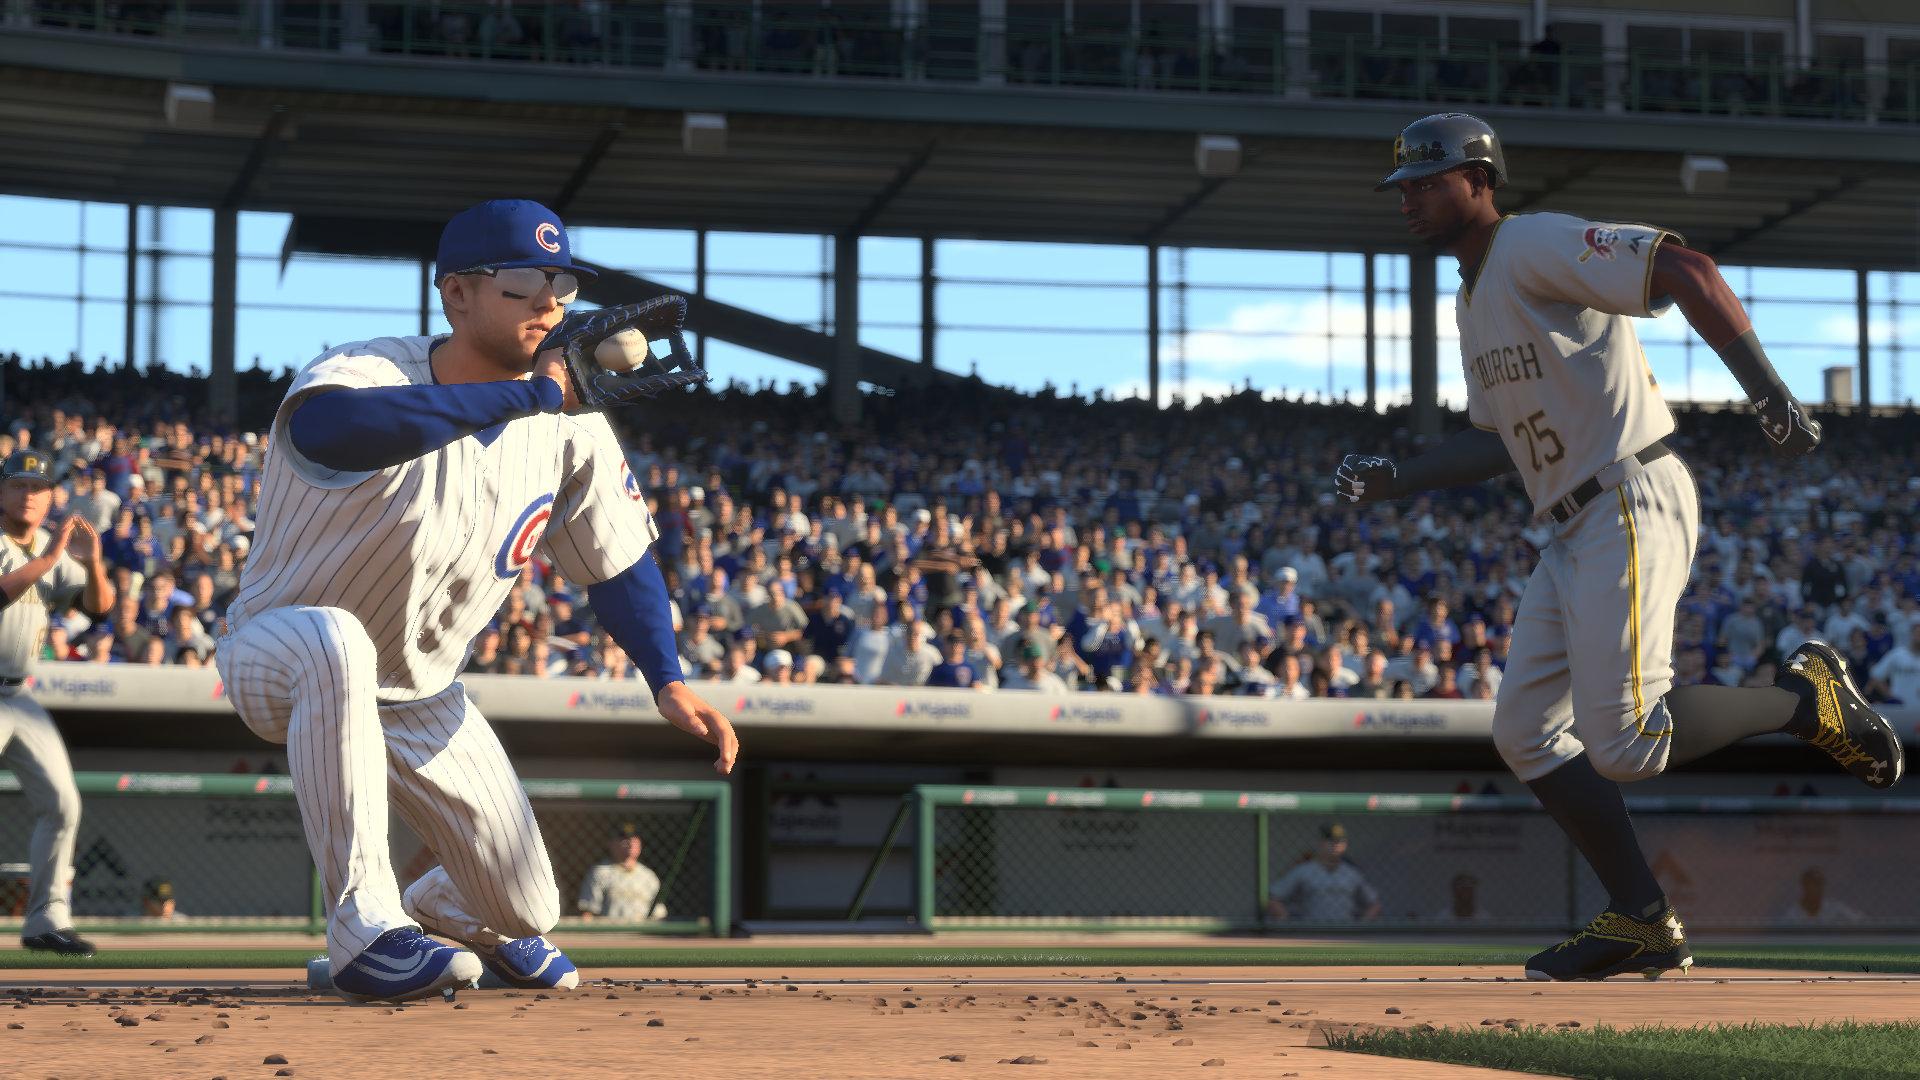 ebb317b3309 MLB® The Show™ 16 Screenshot 20